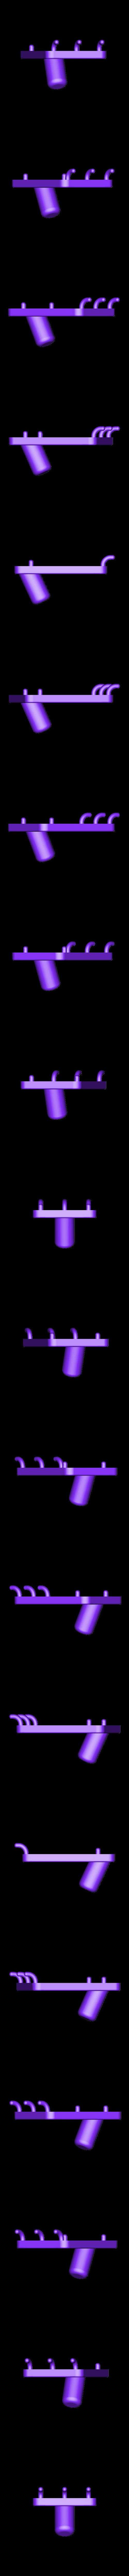 pins.stl Download free STL file Tool holder for oil filter socket 14 sided 031 I for screws or peg board • 3D print model, Wiesemann1893